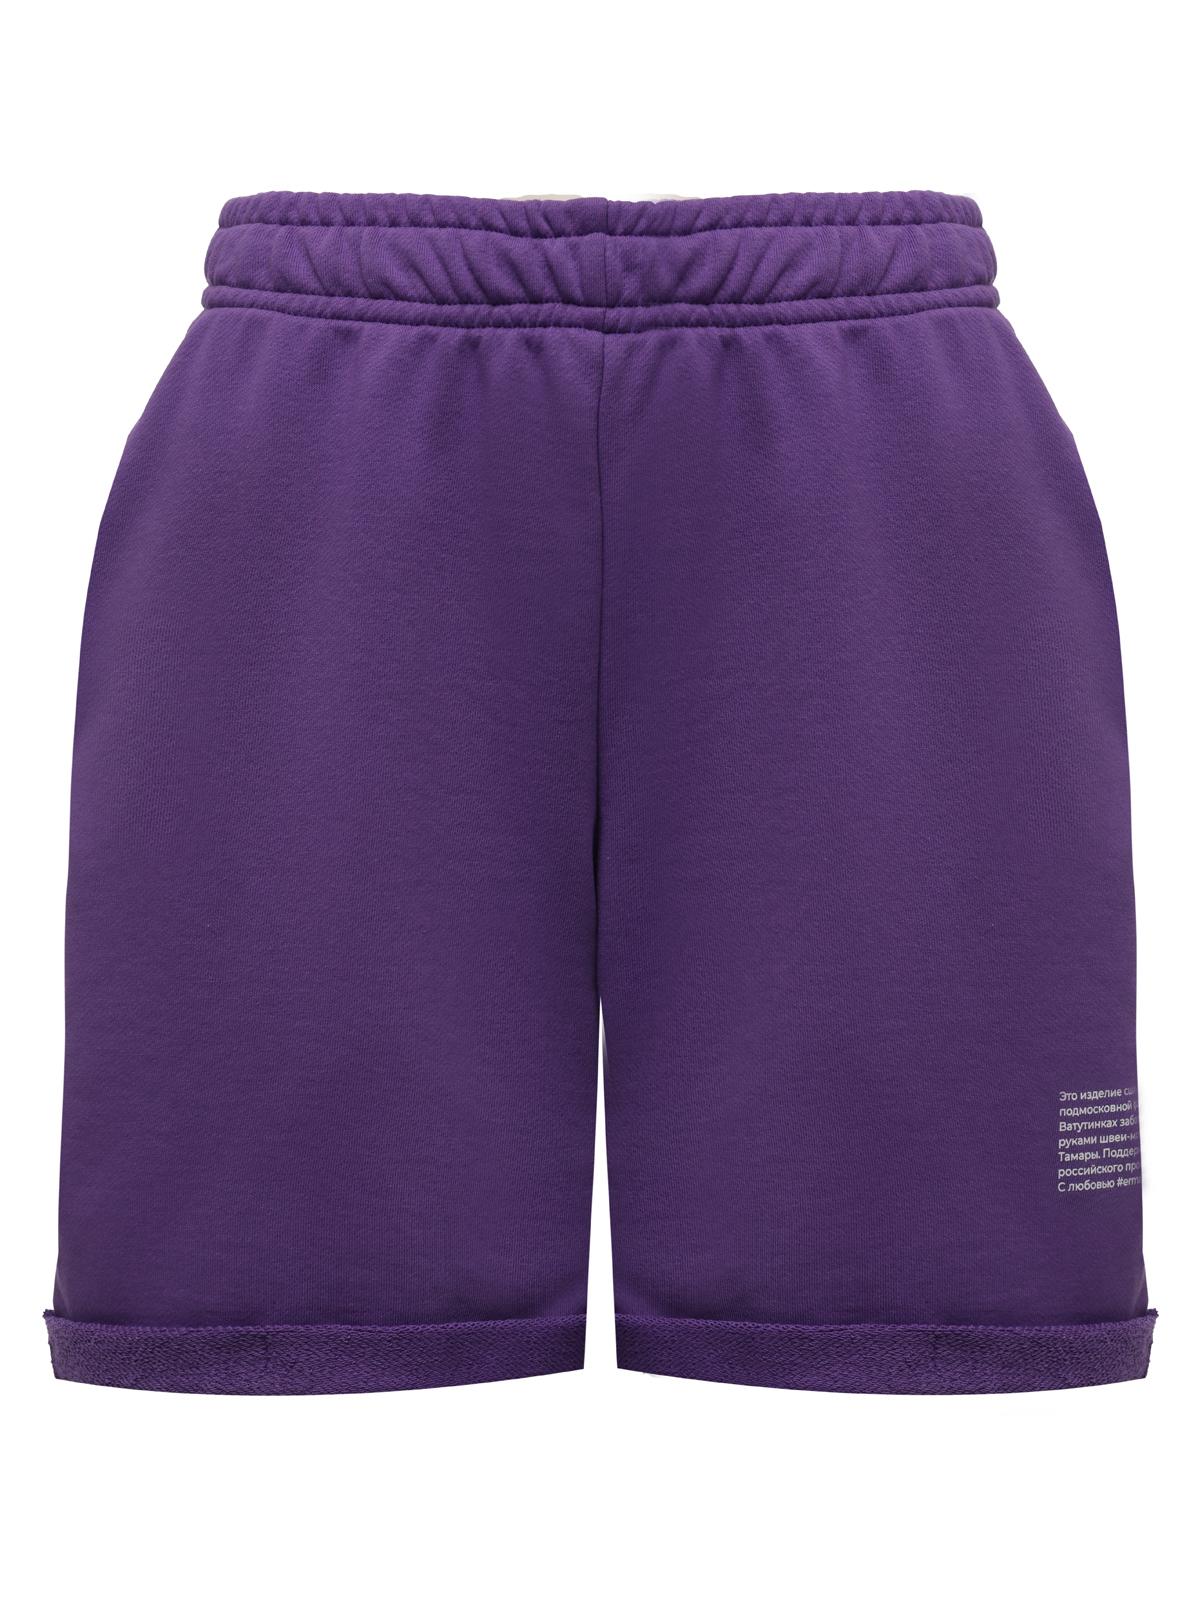 Шорты Фиолетовые (SS0493)